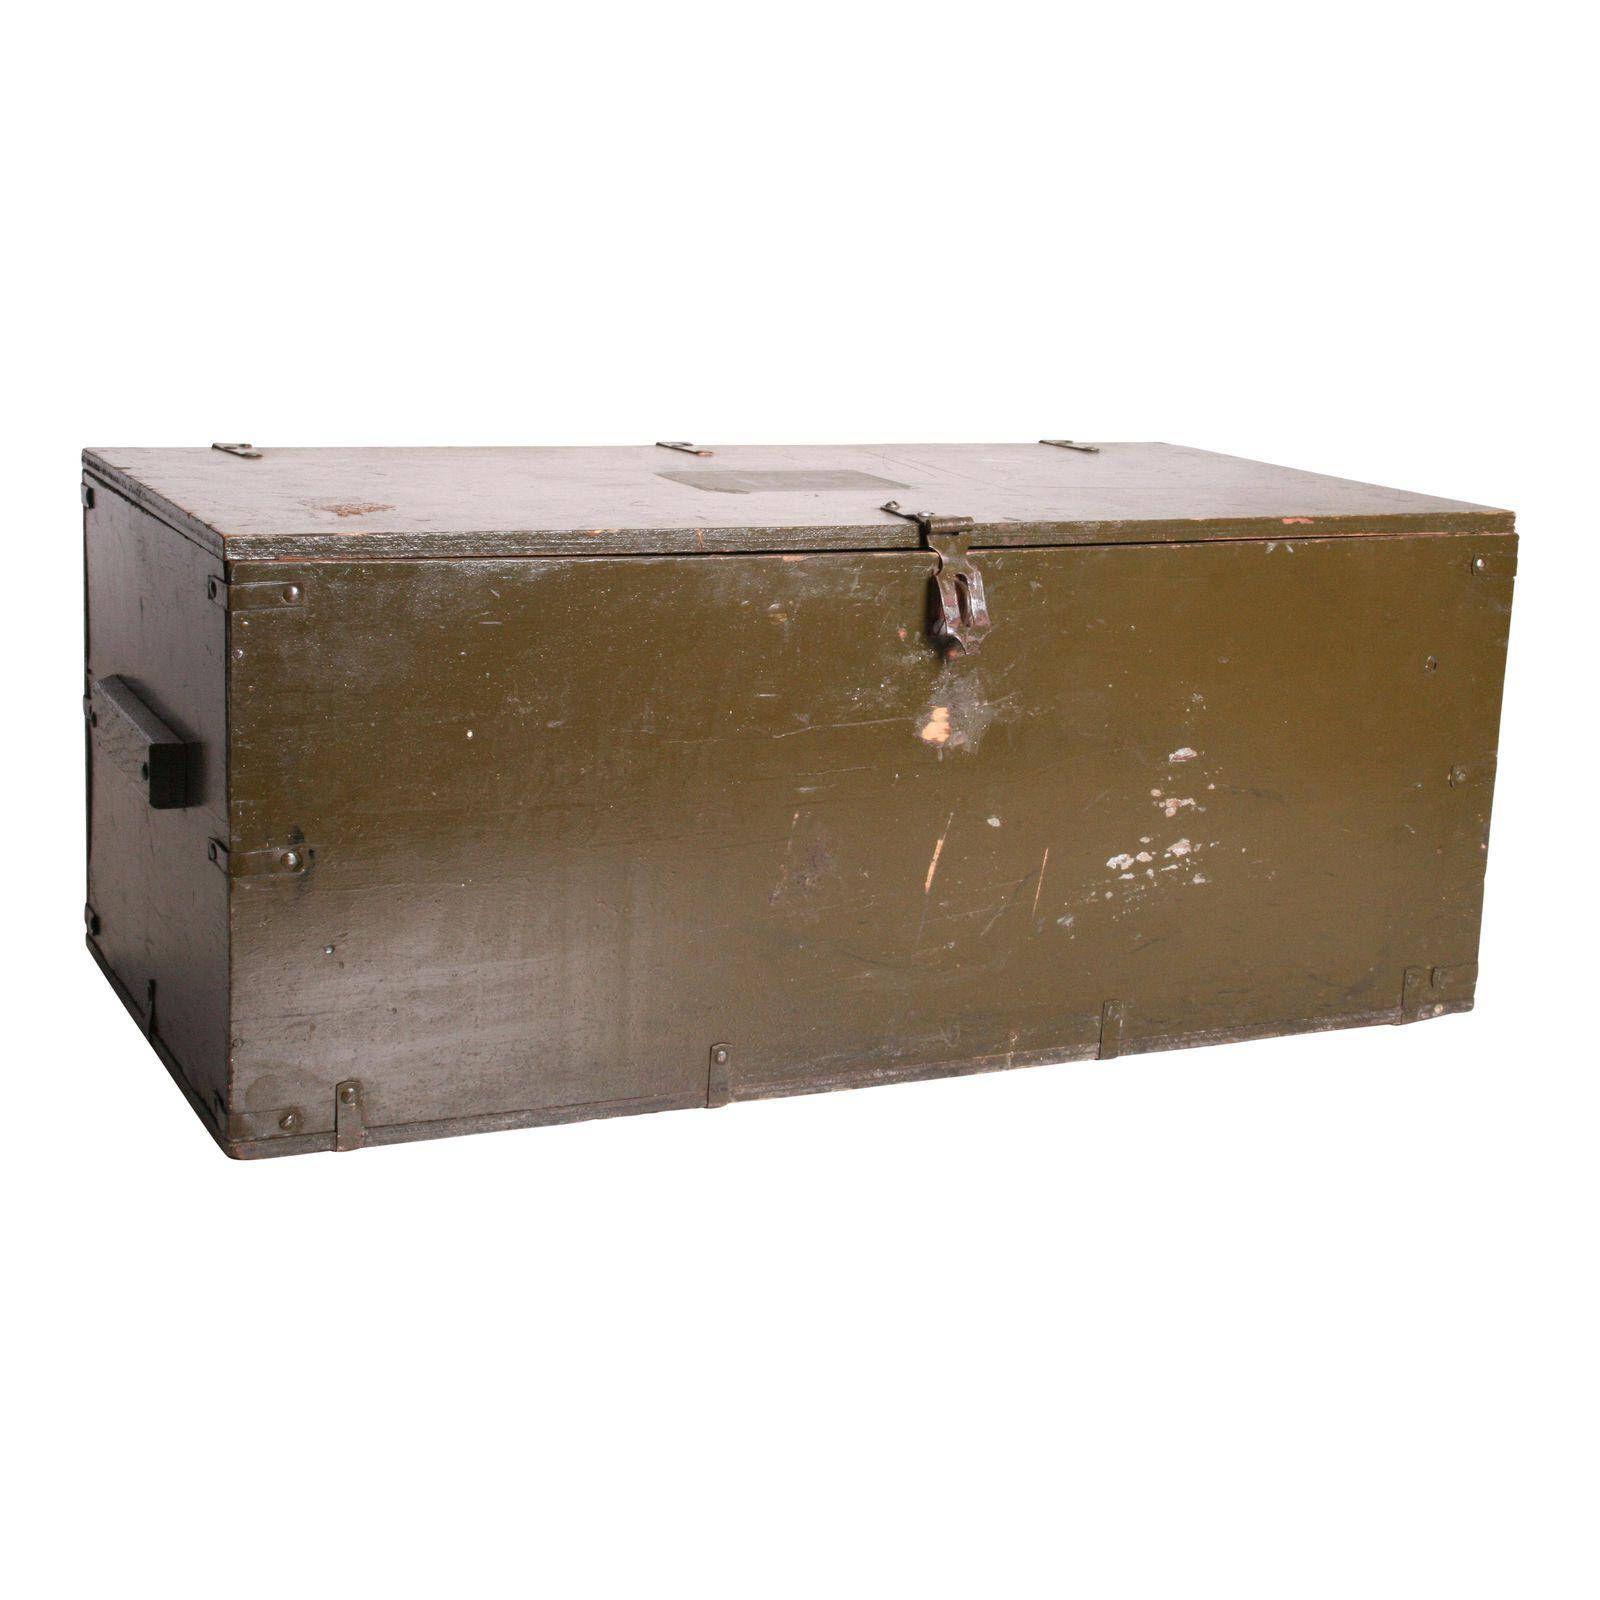 Vintage Military STORAGE TRUNK W Tray ~ Black Drab Green Flat Top Foot  Locker Wwii Ww2